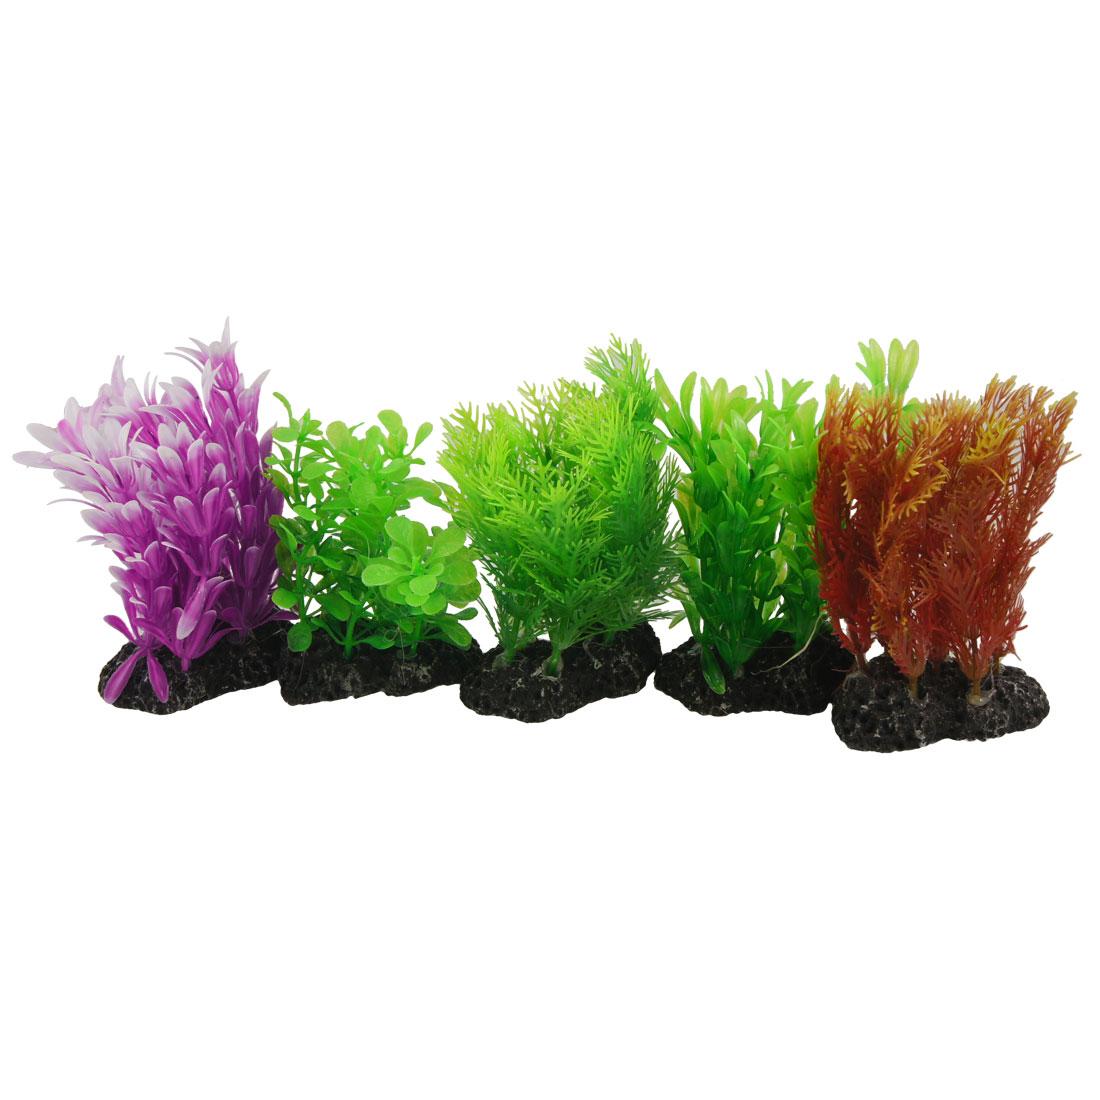 "5 Pcs Aquarium Decor Fuchsia Green 4.7"" Manmade Plastic Grass Water Plants"